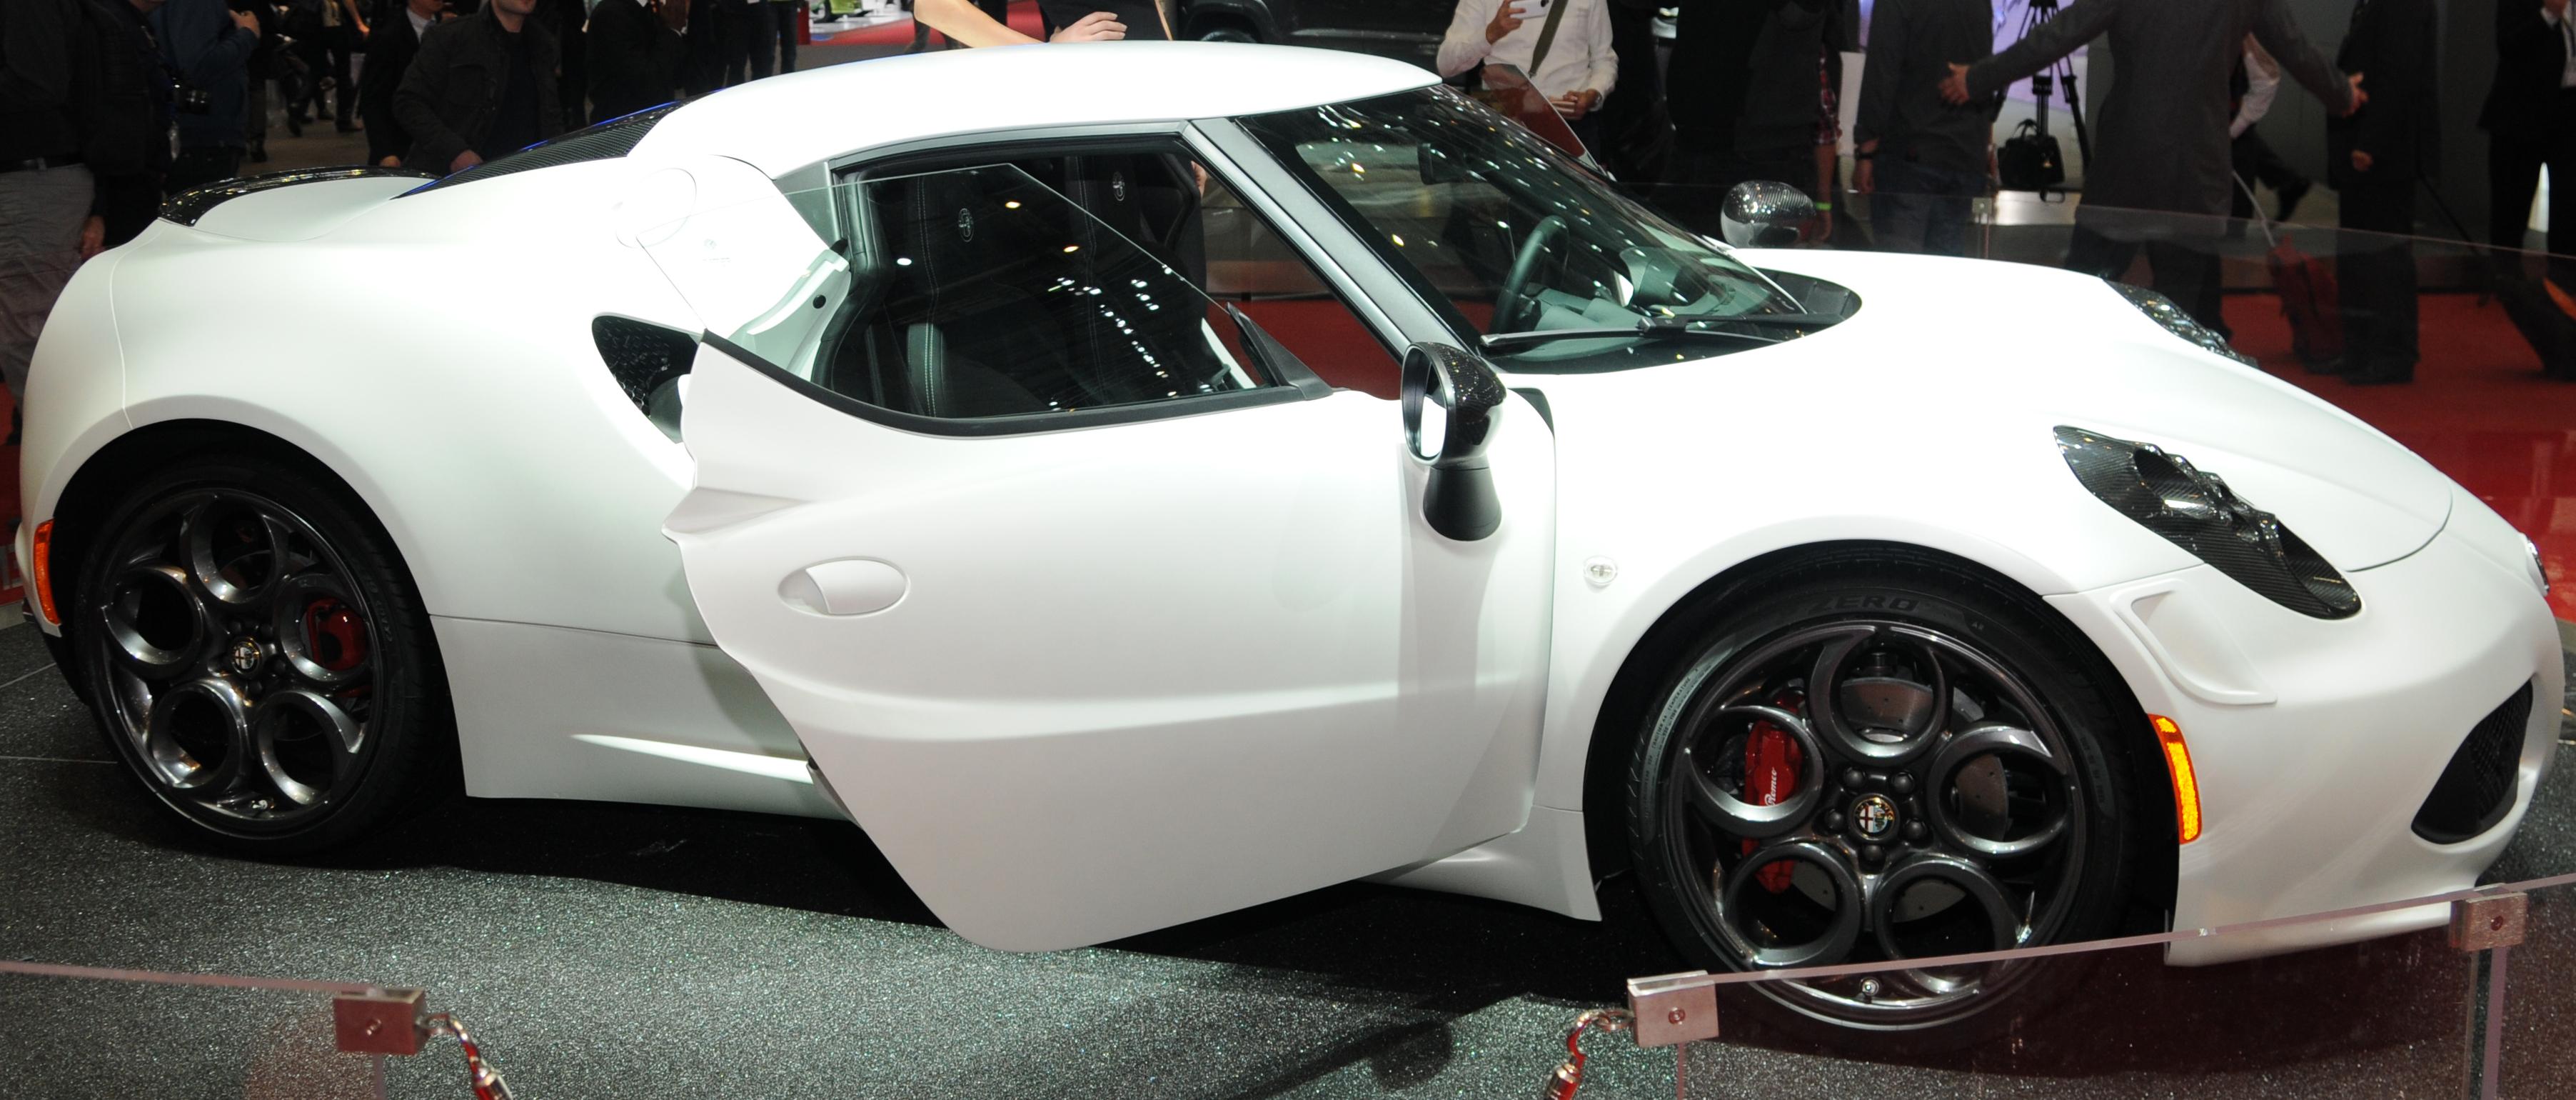 Italian Sports Car Museums